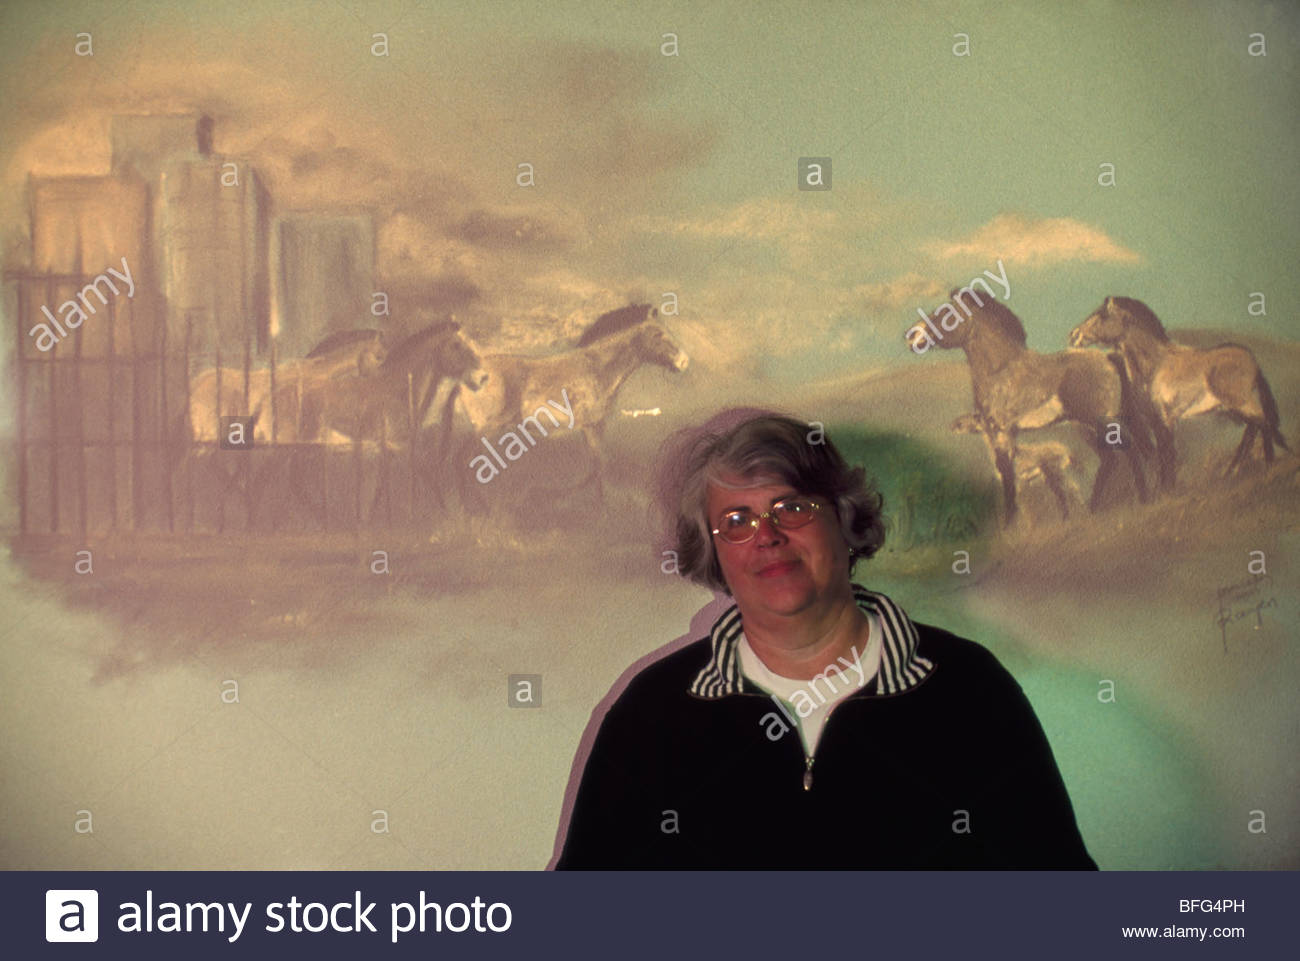 Inge Bouman poses in front of painting illustrating transfer of takhis from captivity to freedom, Hustain Nuruu - Stock Image